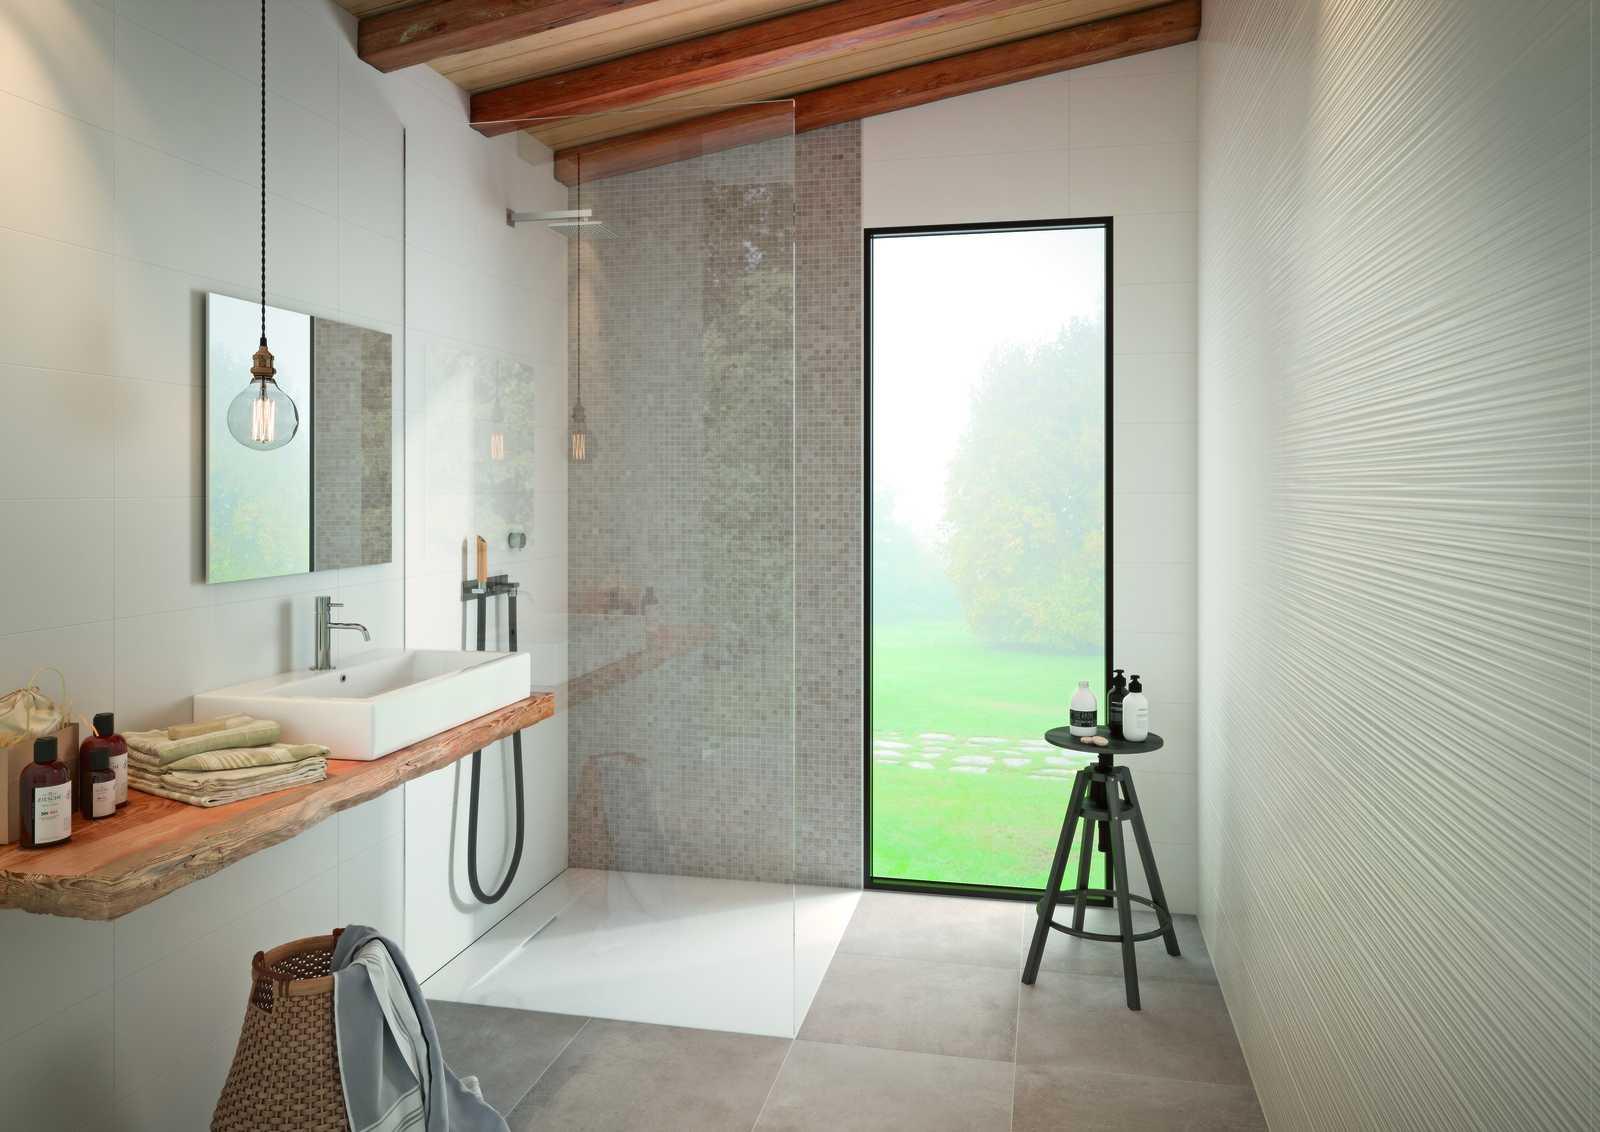 bathroom flooring ceramic and porcelain stoneware marazzi. Black Bedroom Furniture Sets. Home Design Ideas